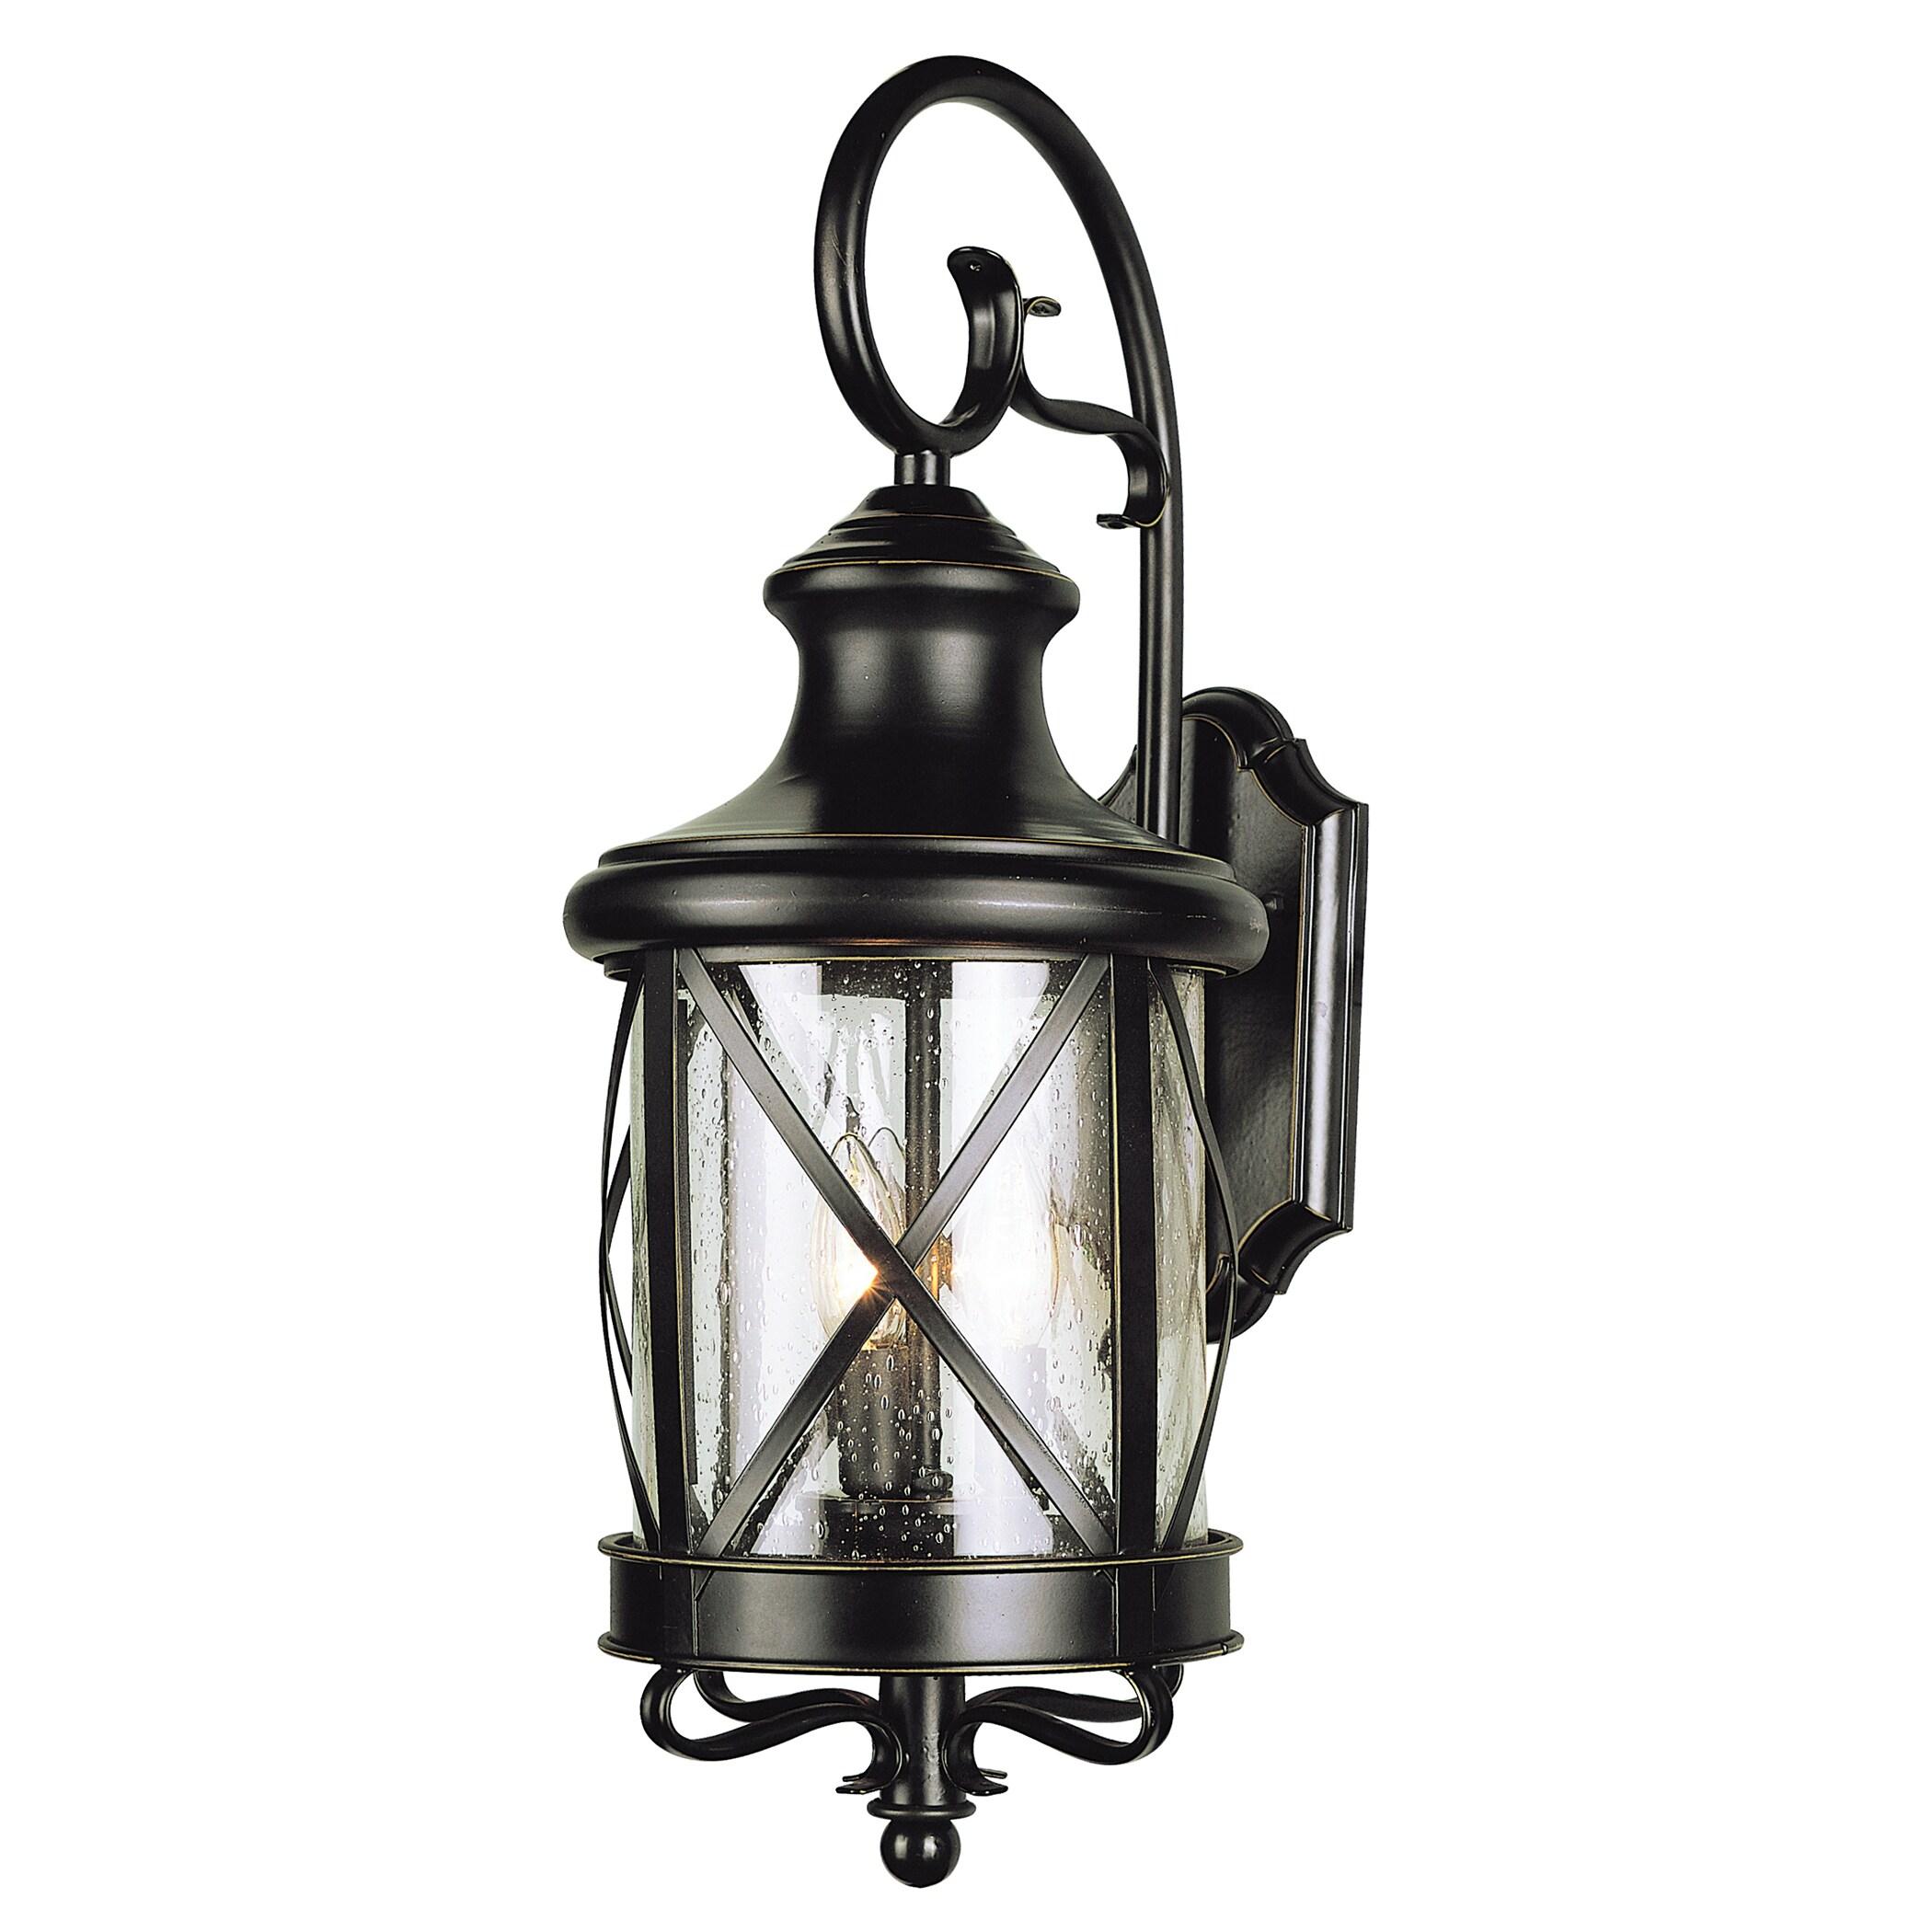 Bel Air Lighting Cb 5120 Rob 19 Inch 2 Light Outdoor Lantern